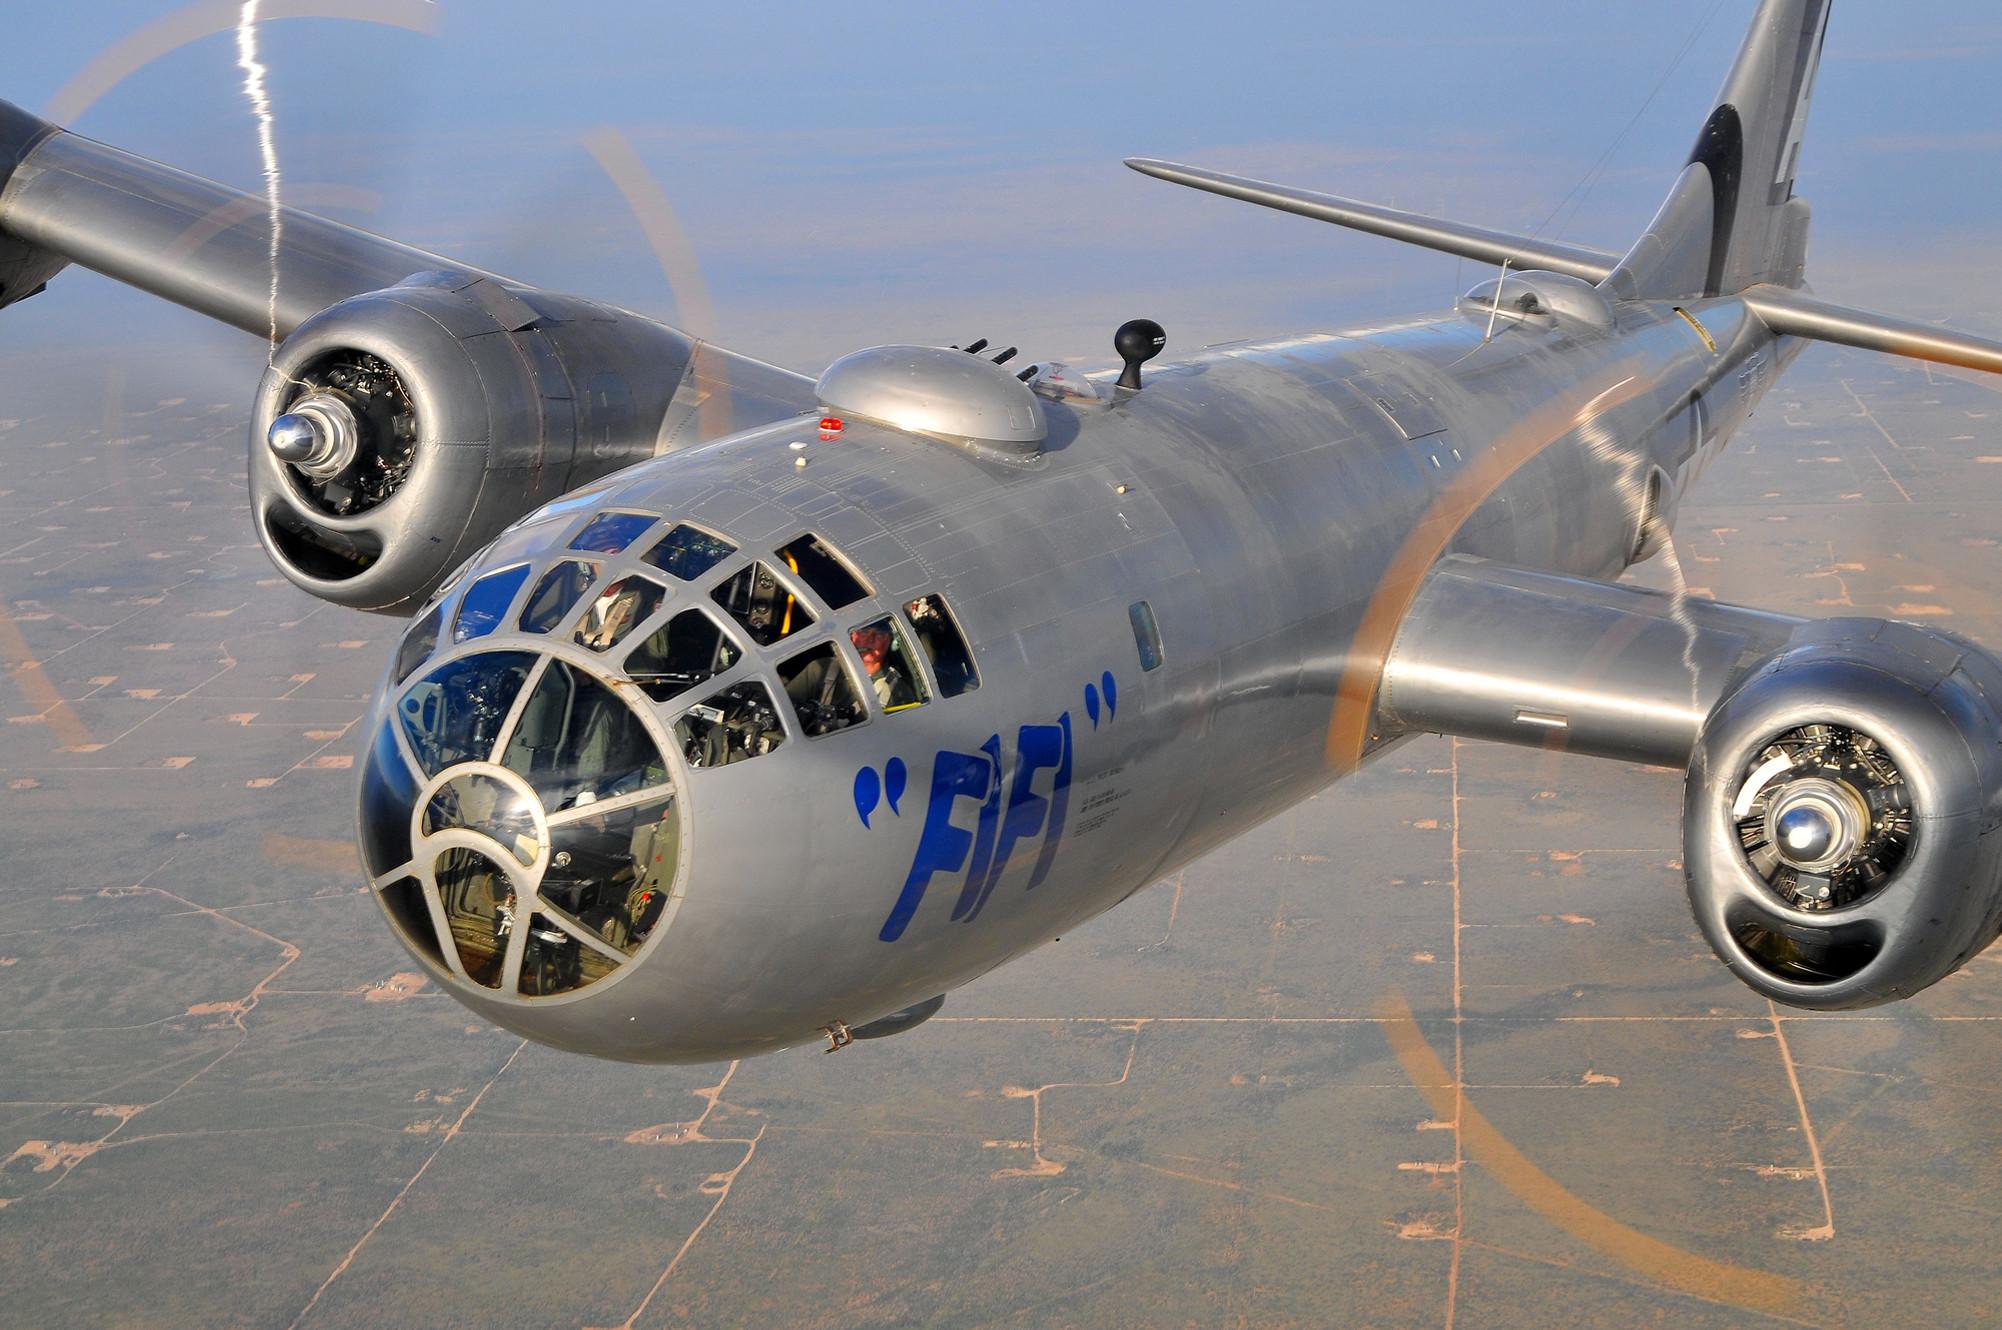 www.airpowersquadron.org